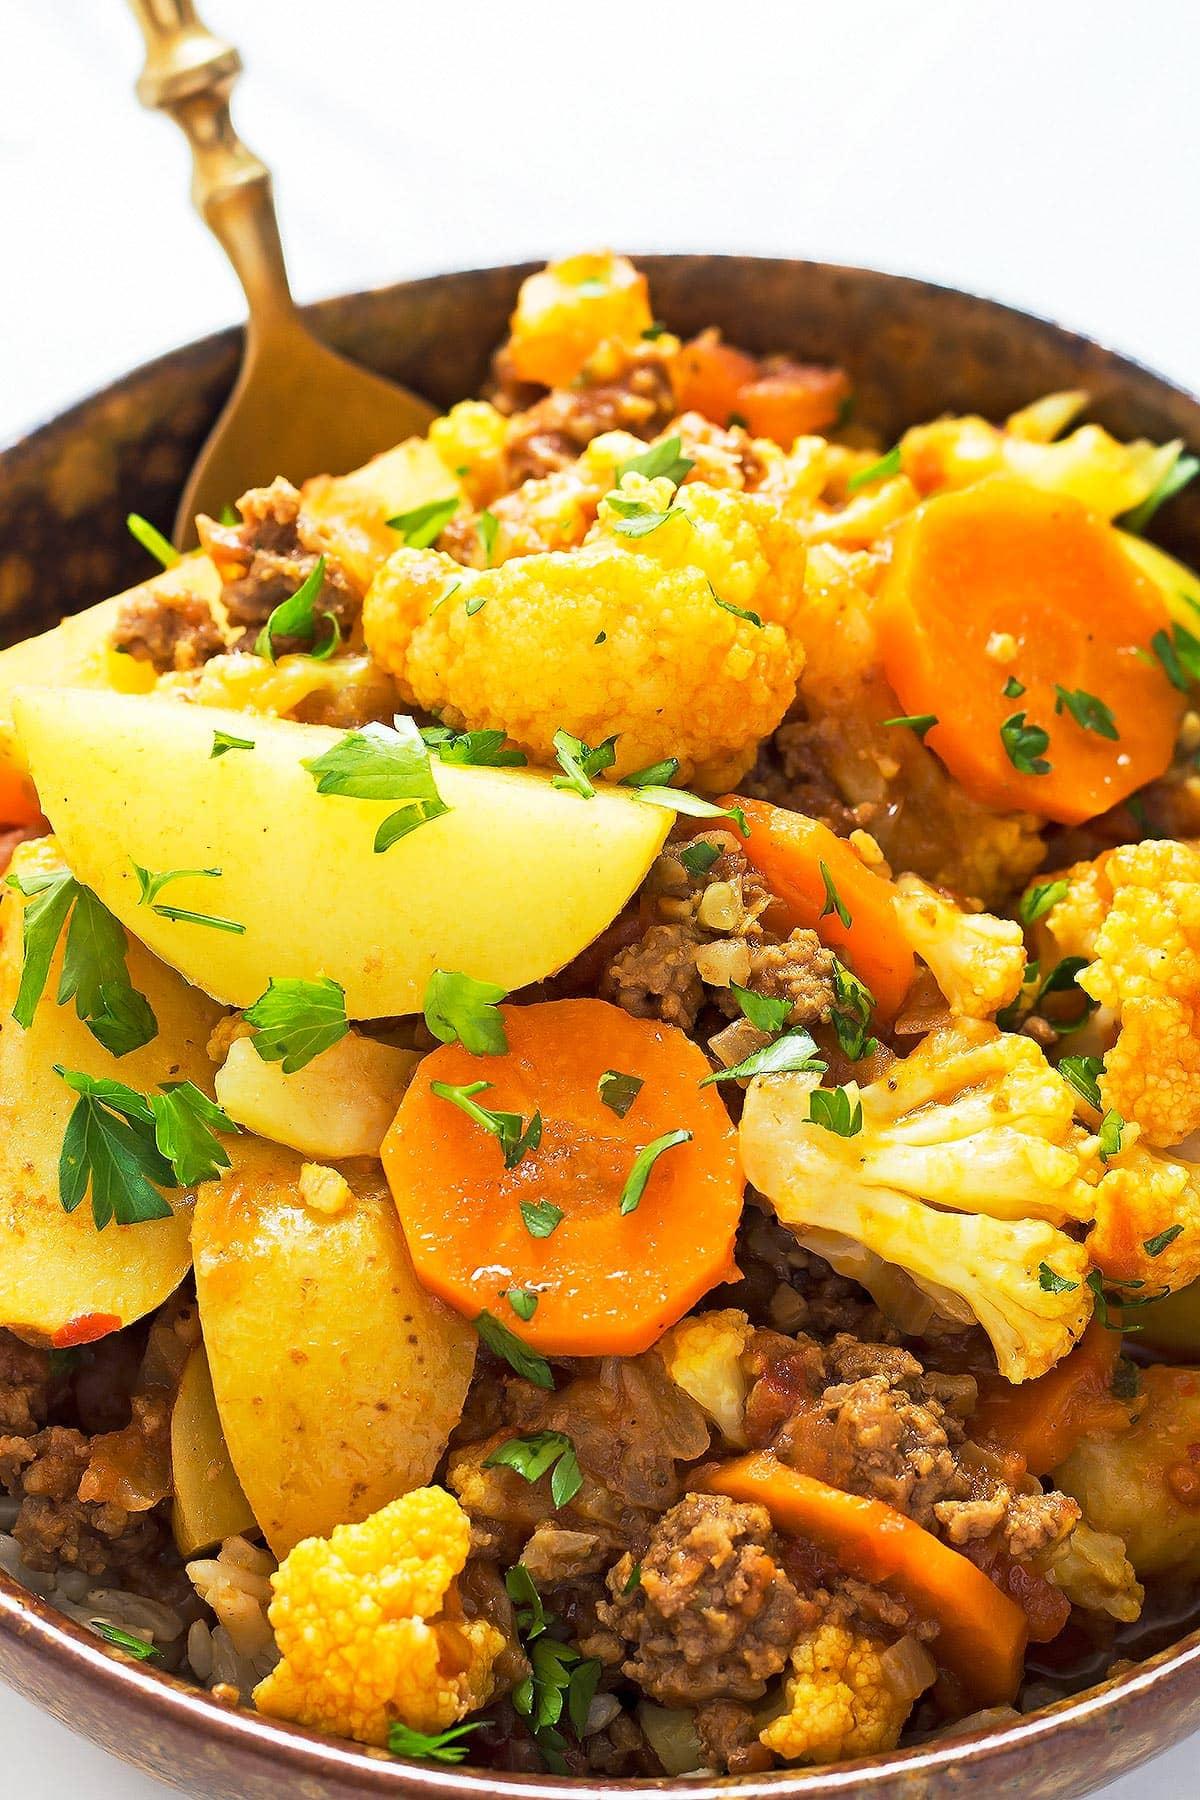 Bowl of Keema Curry